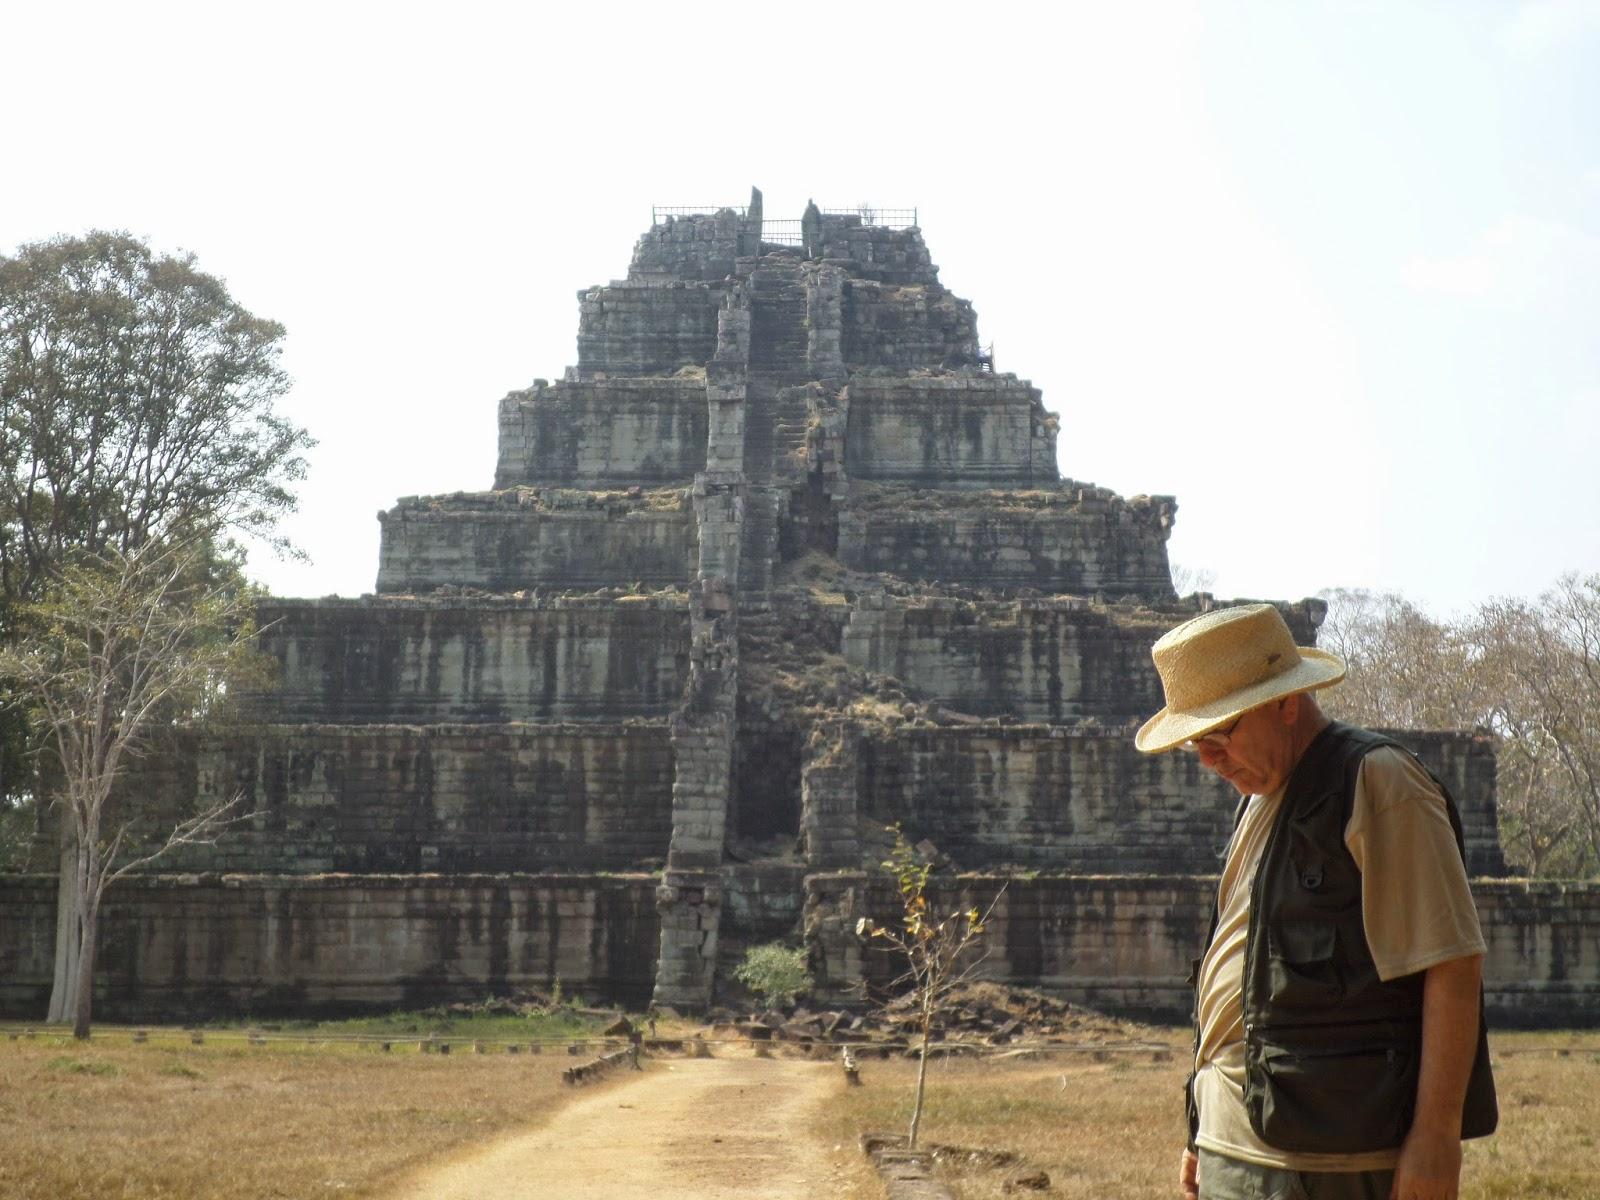 aztec and mayan similarities